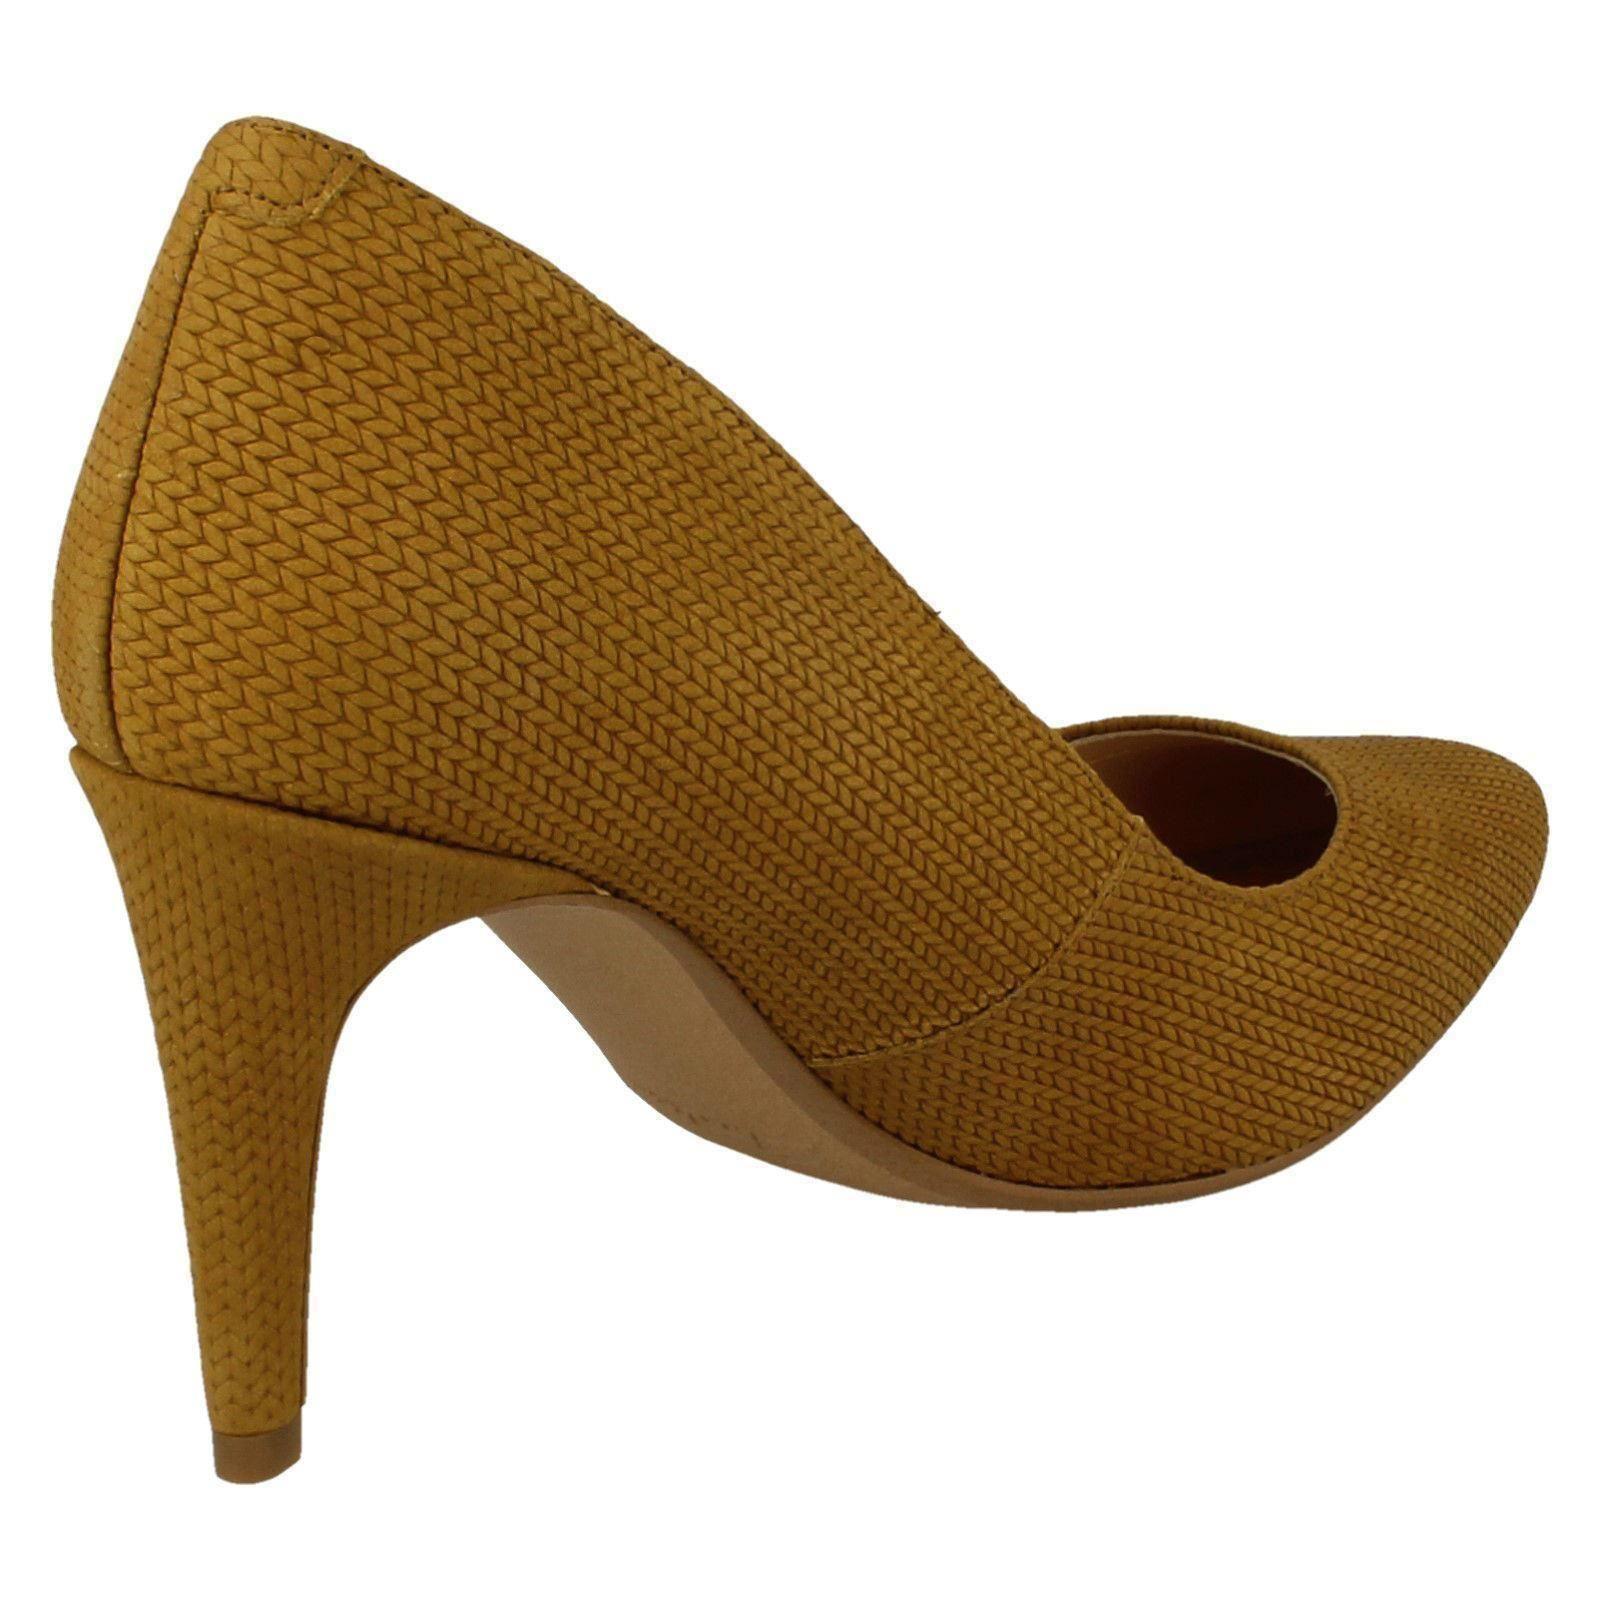 287bcff6257 ... Señoras Elegantes Tacón Alto Tribunal Zapatos Zapatos Tribunal Clarks   Laina Rae  348192 ...